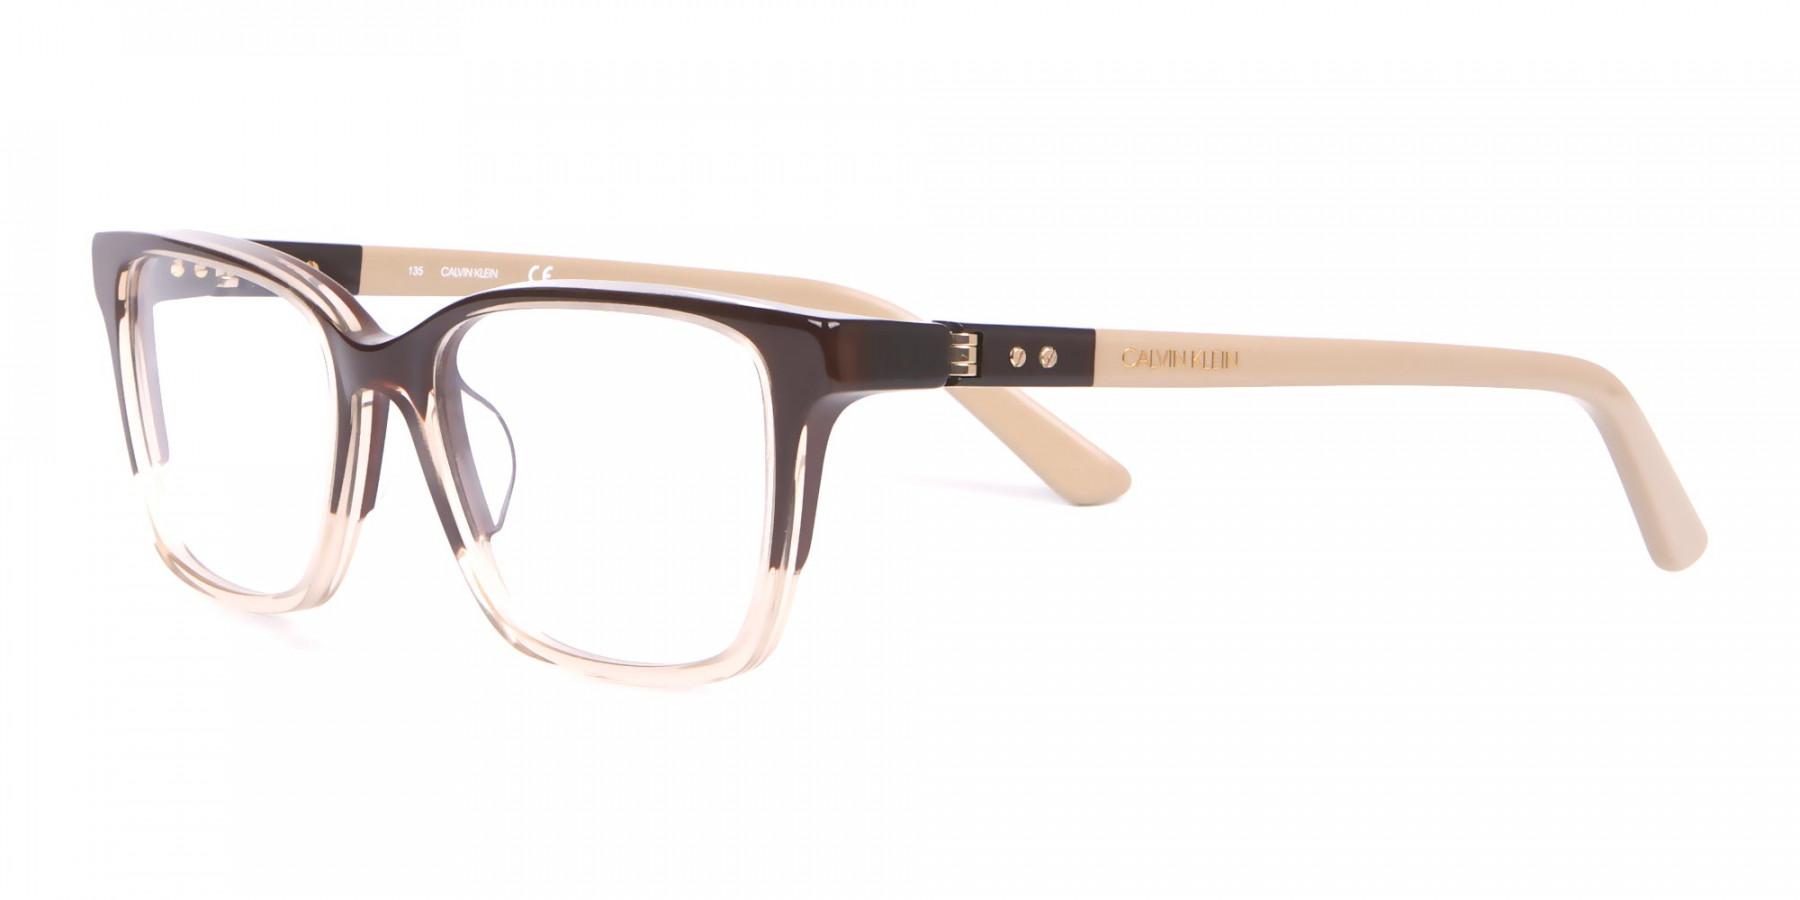 Calvin Klein CK19506 Two-Toned Rectangular Glasses Brown-1